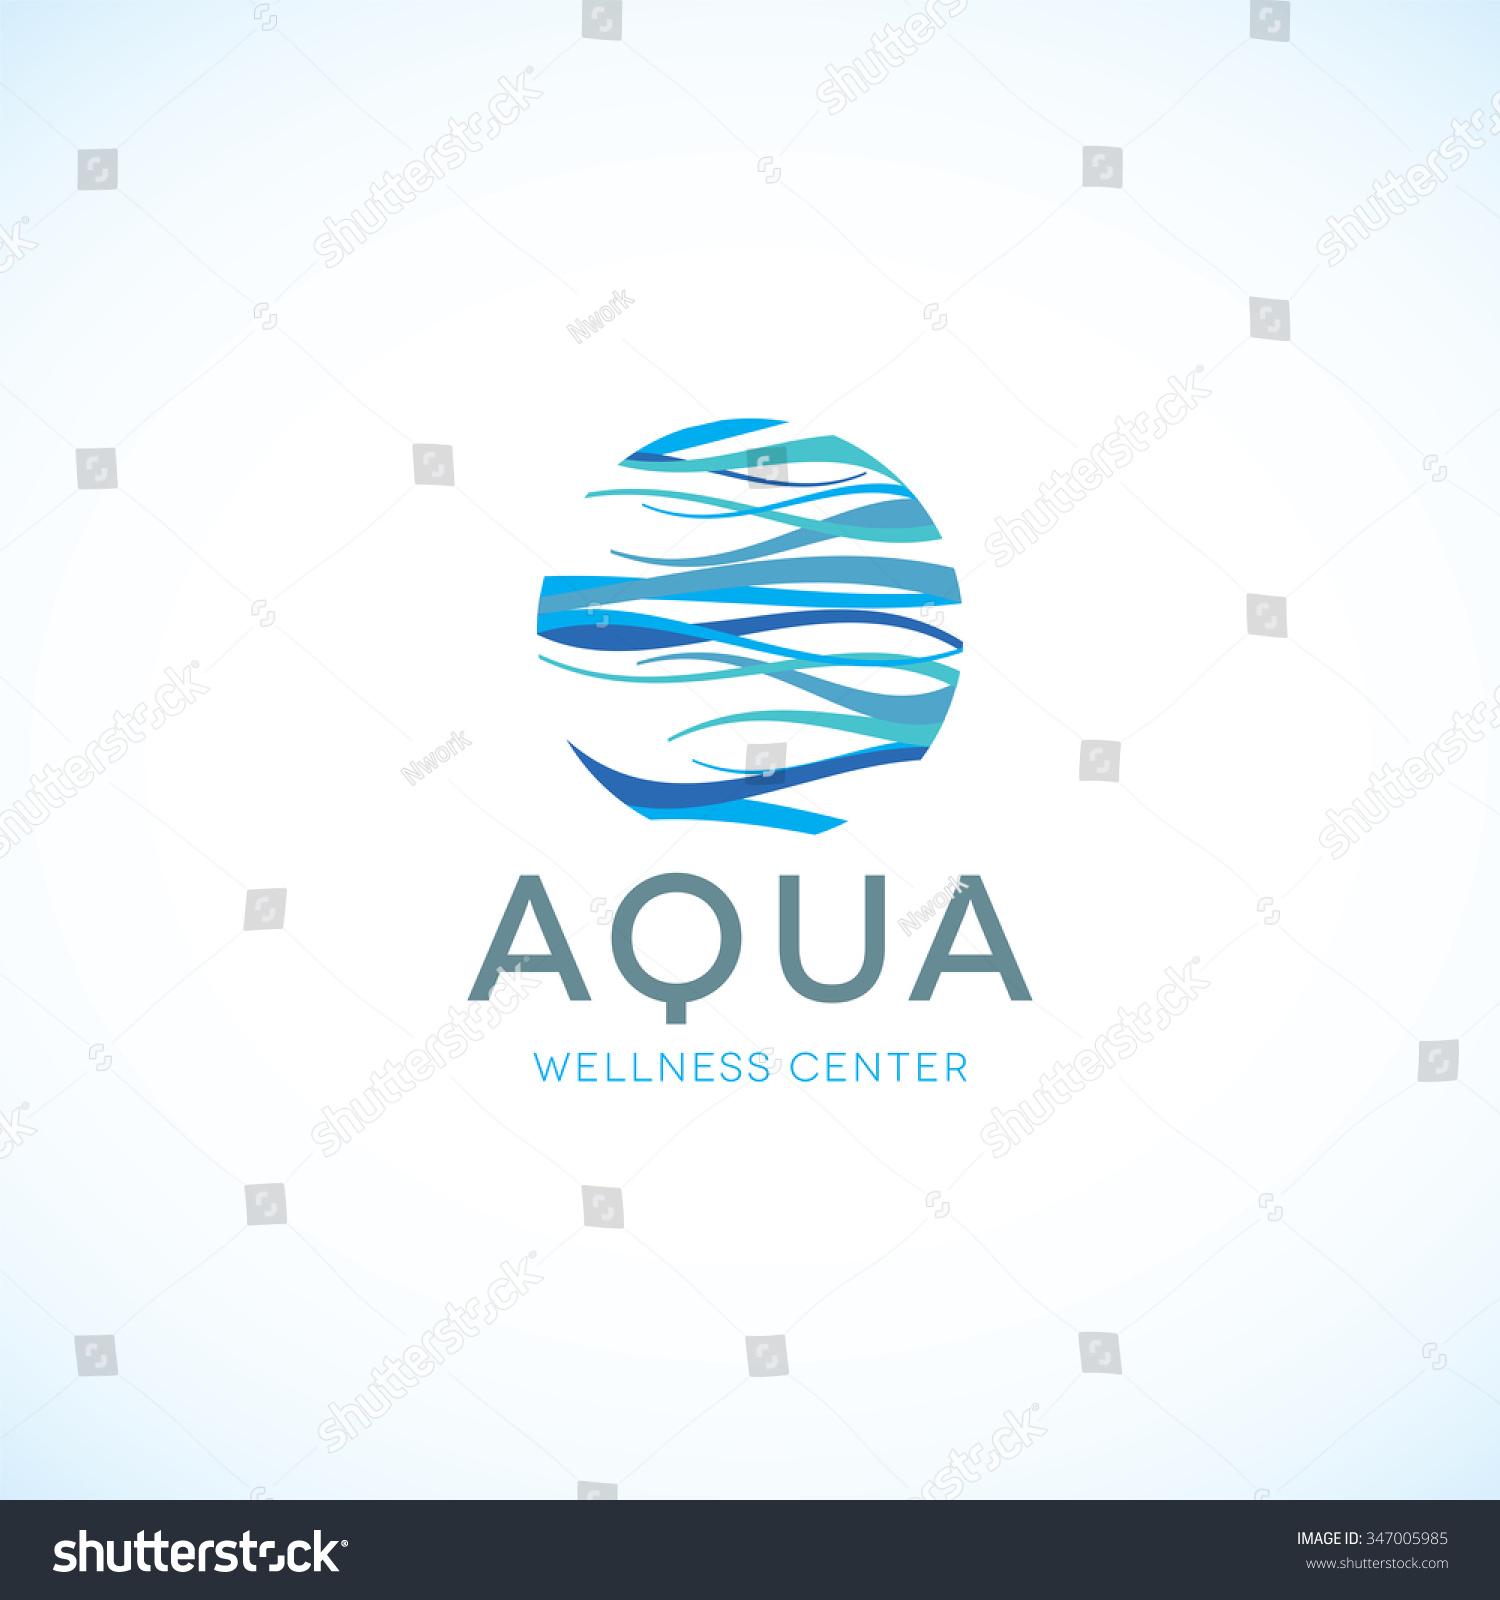 logo. Aqua logo. Wellness logo. spa logo. Mineral natural water logo ...: www.shutterstock.com/pic-347005985/stock-vector-water-logo-aqua...